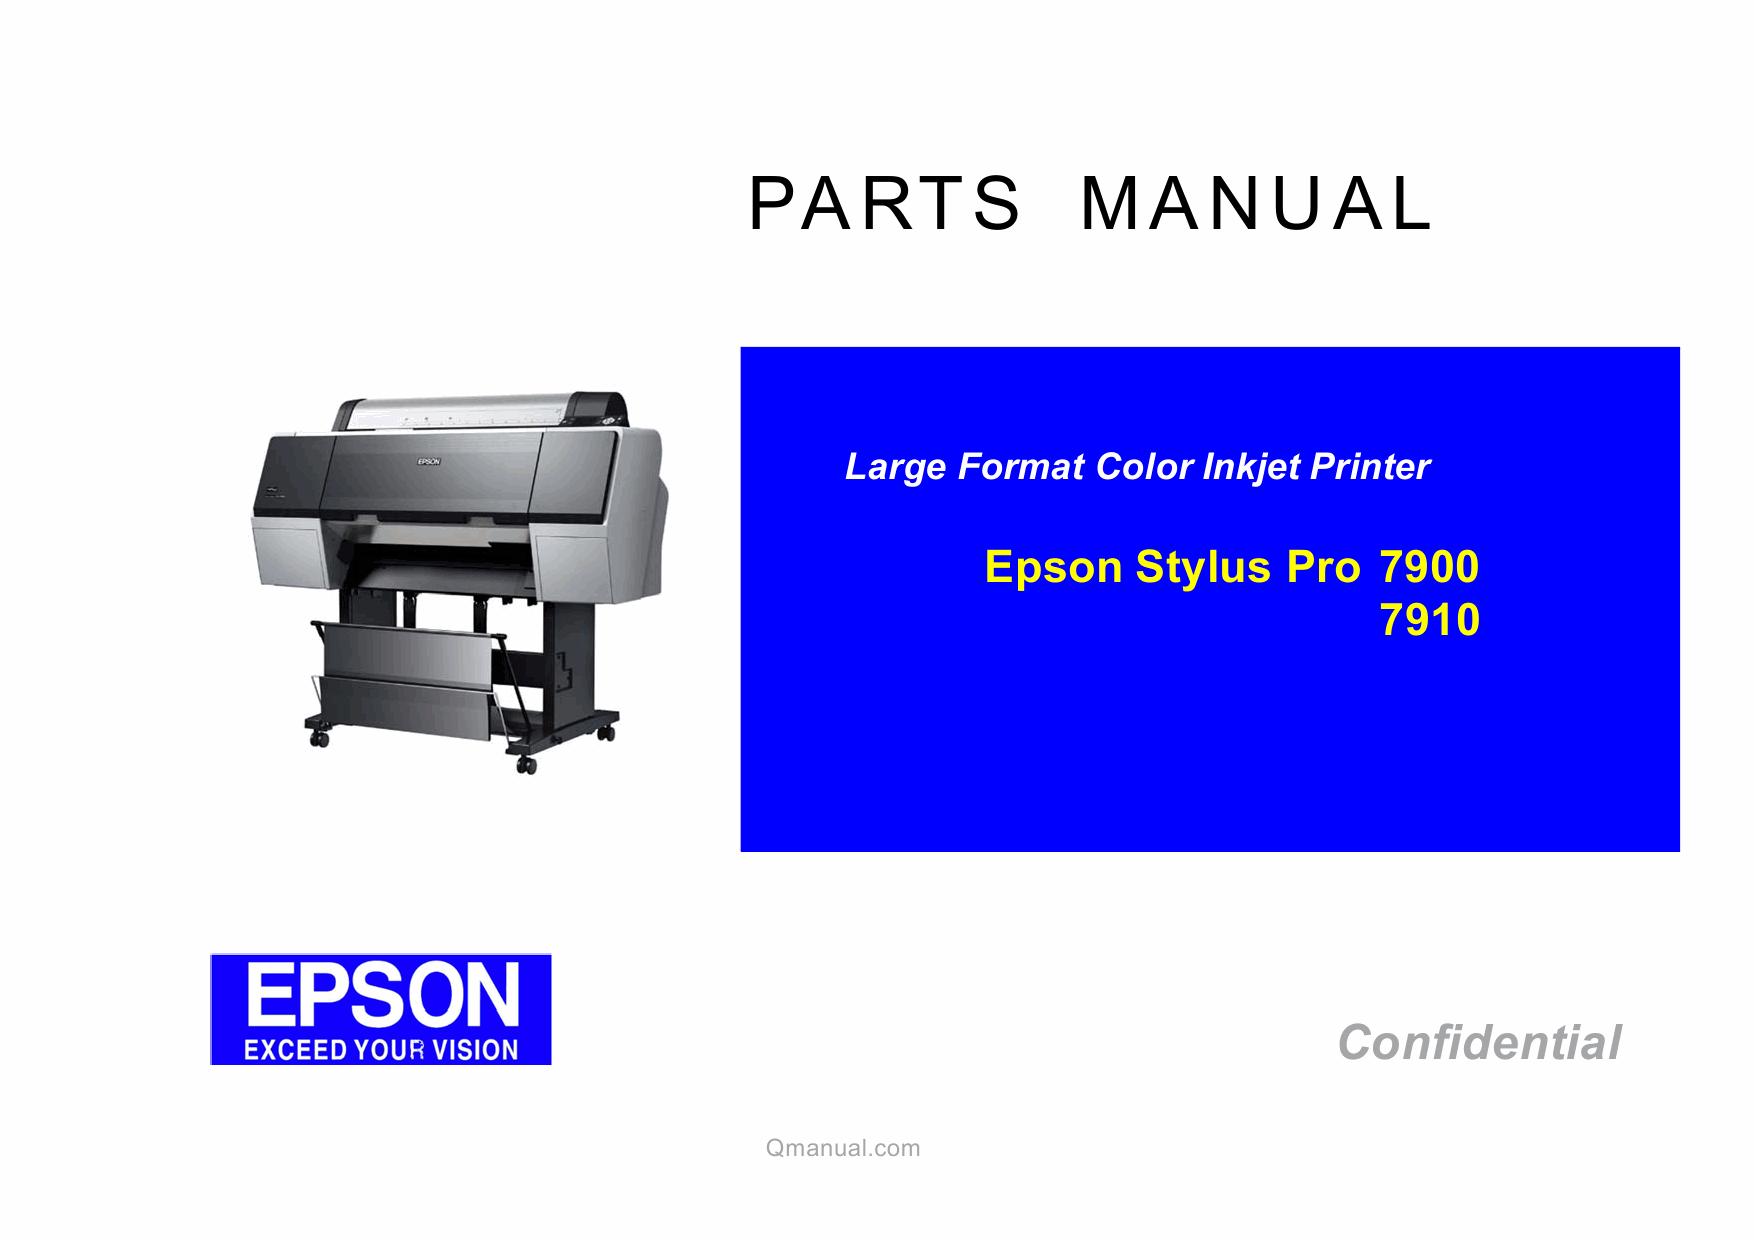 epson styluspro 7900 7910 parts manual epson stylus pro 7890 manual epson pro 7890 manual